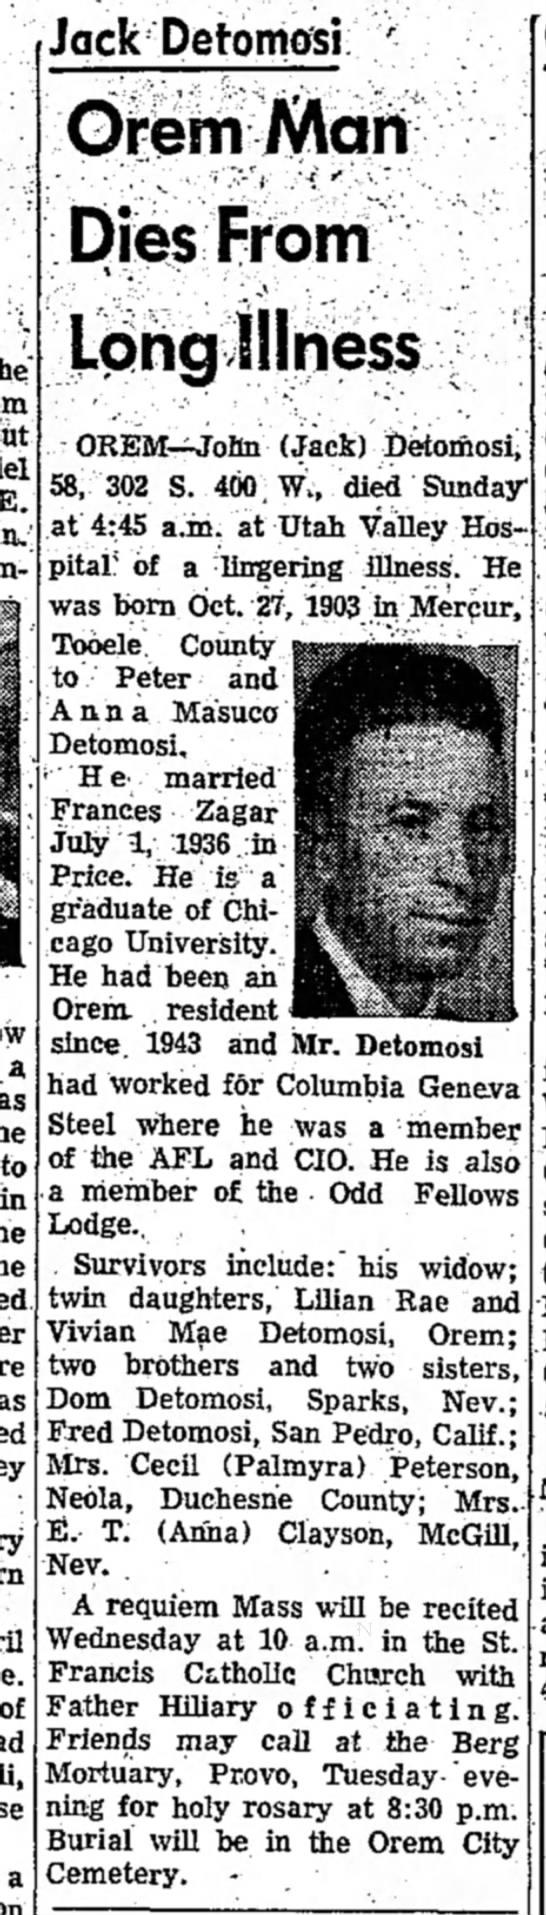 "1961 ZAGAR --JACK DETOMOSI - E. a as to in of a Jack Detomosi Orem Man ""~'t..."